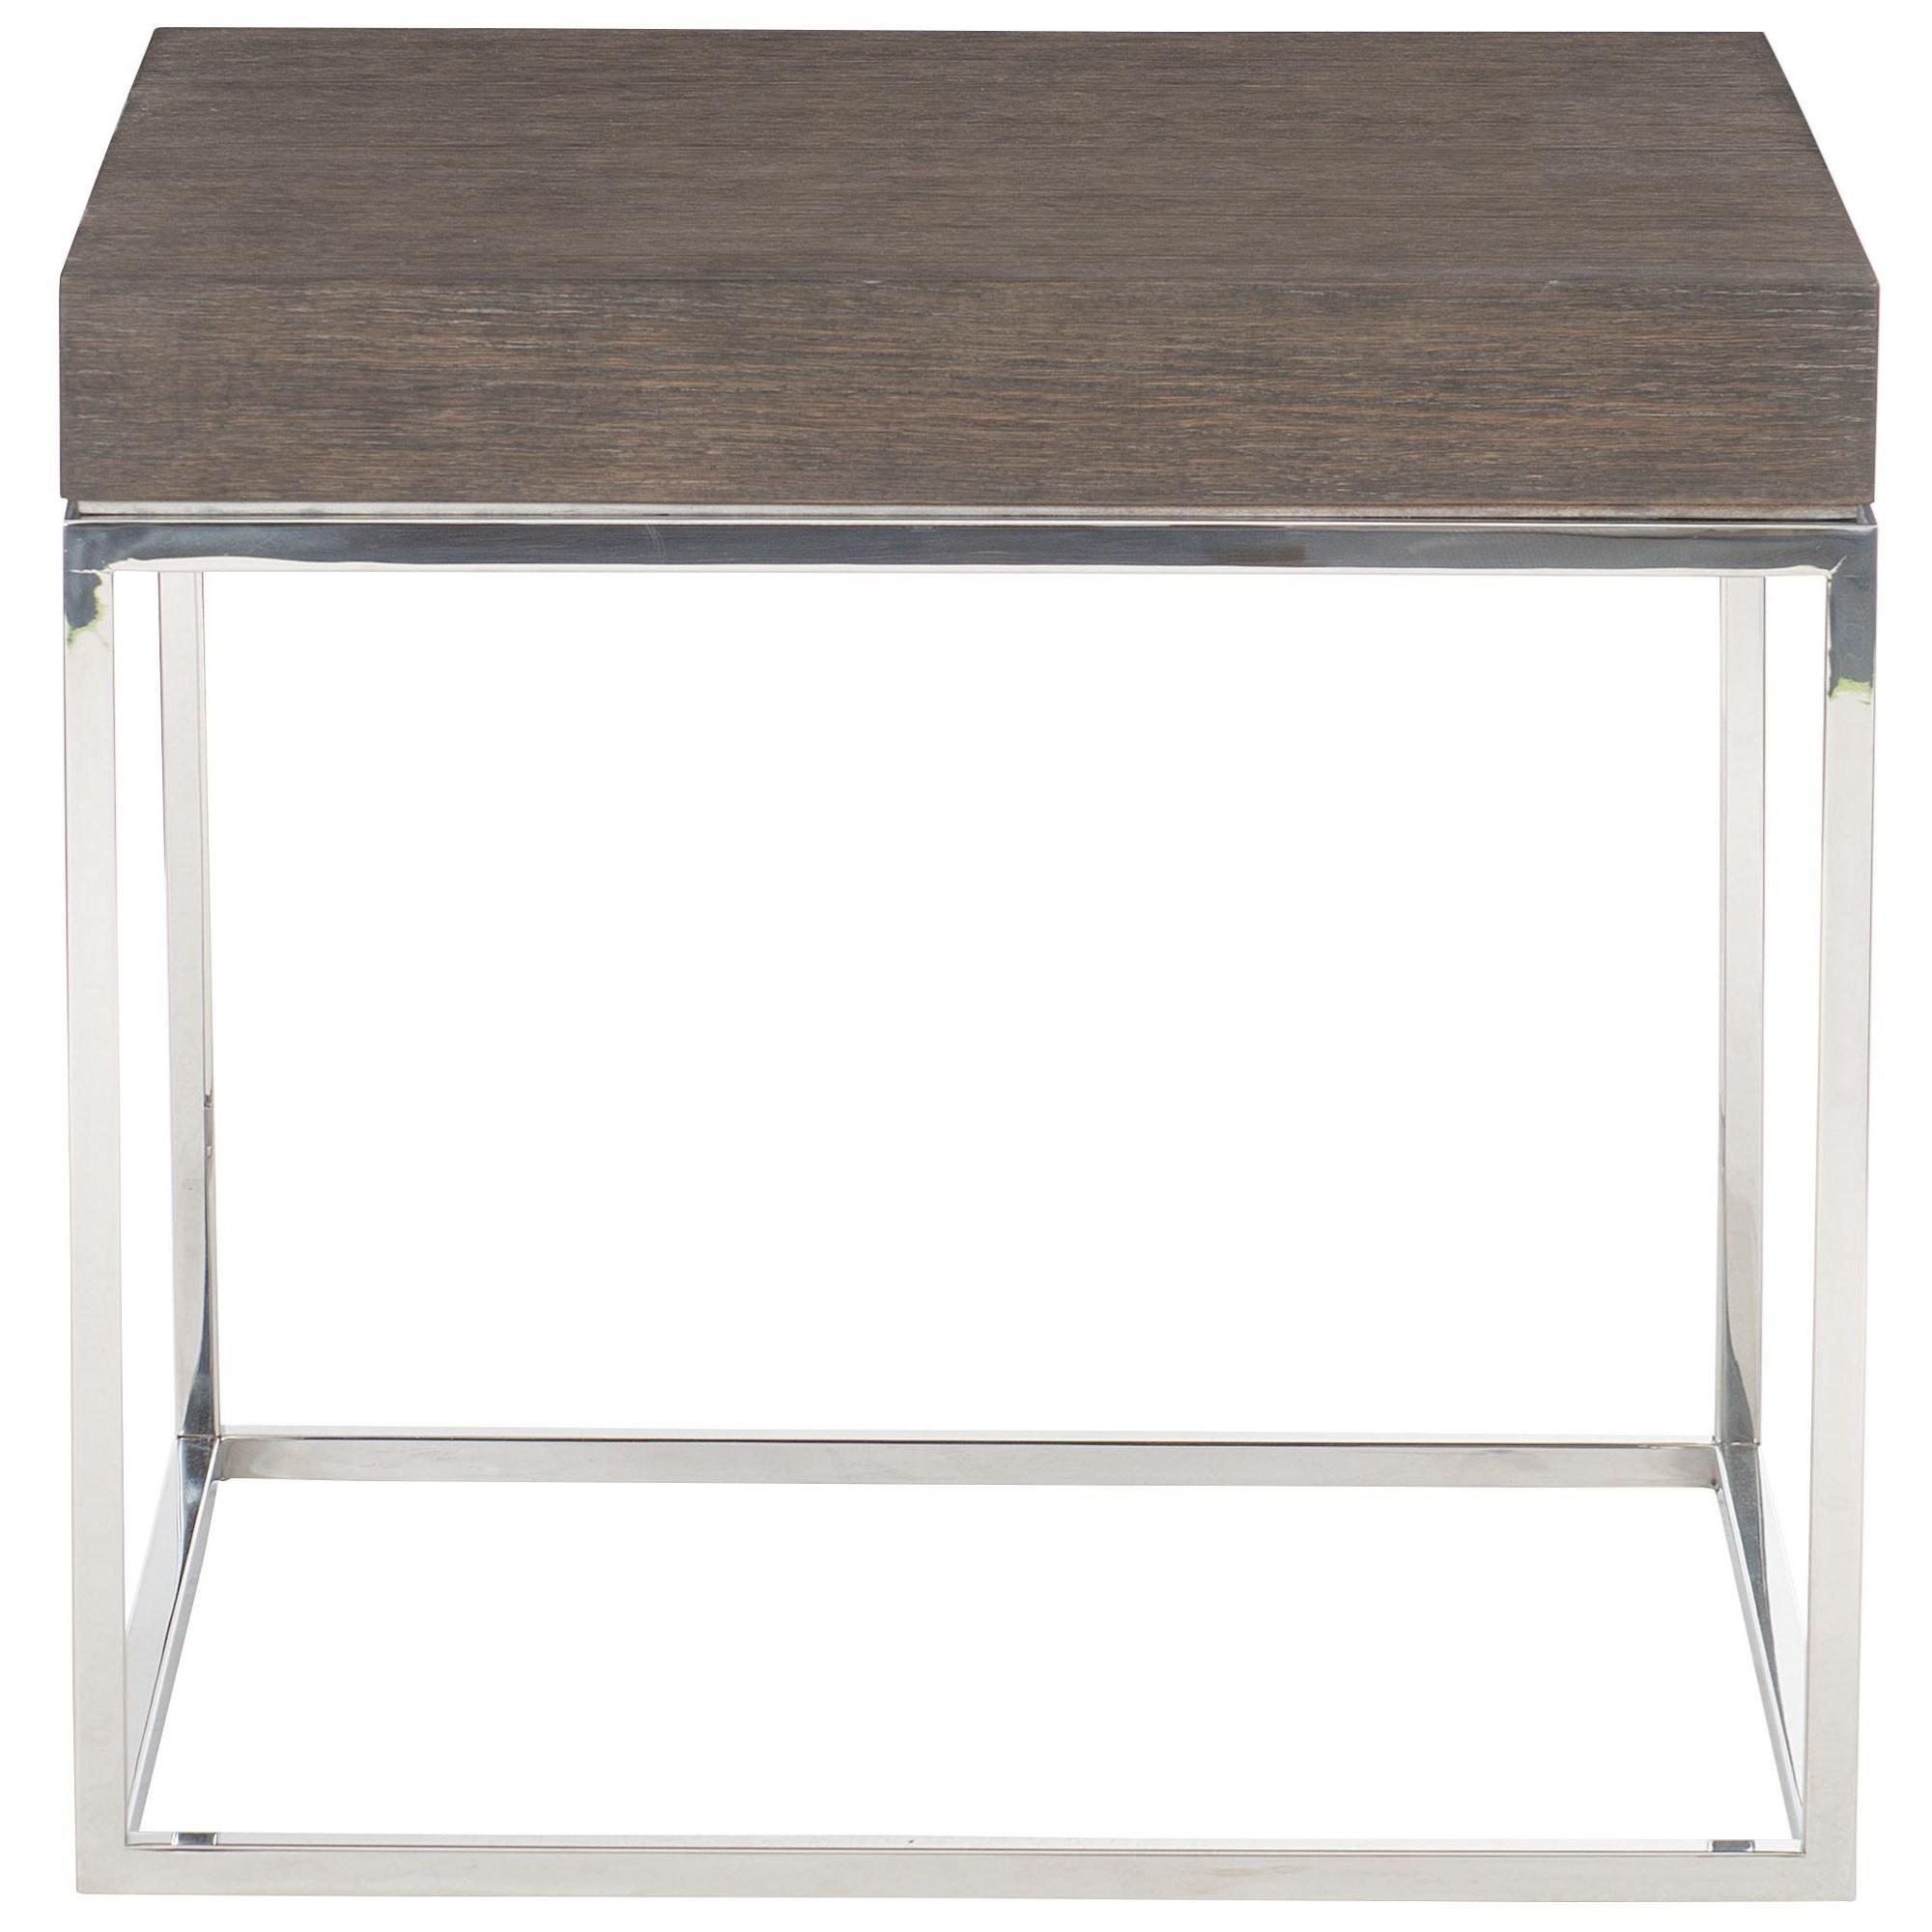 Riverside End Table by Bernhardt at Darvin Furniture